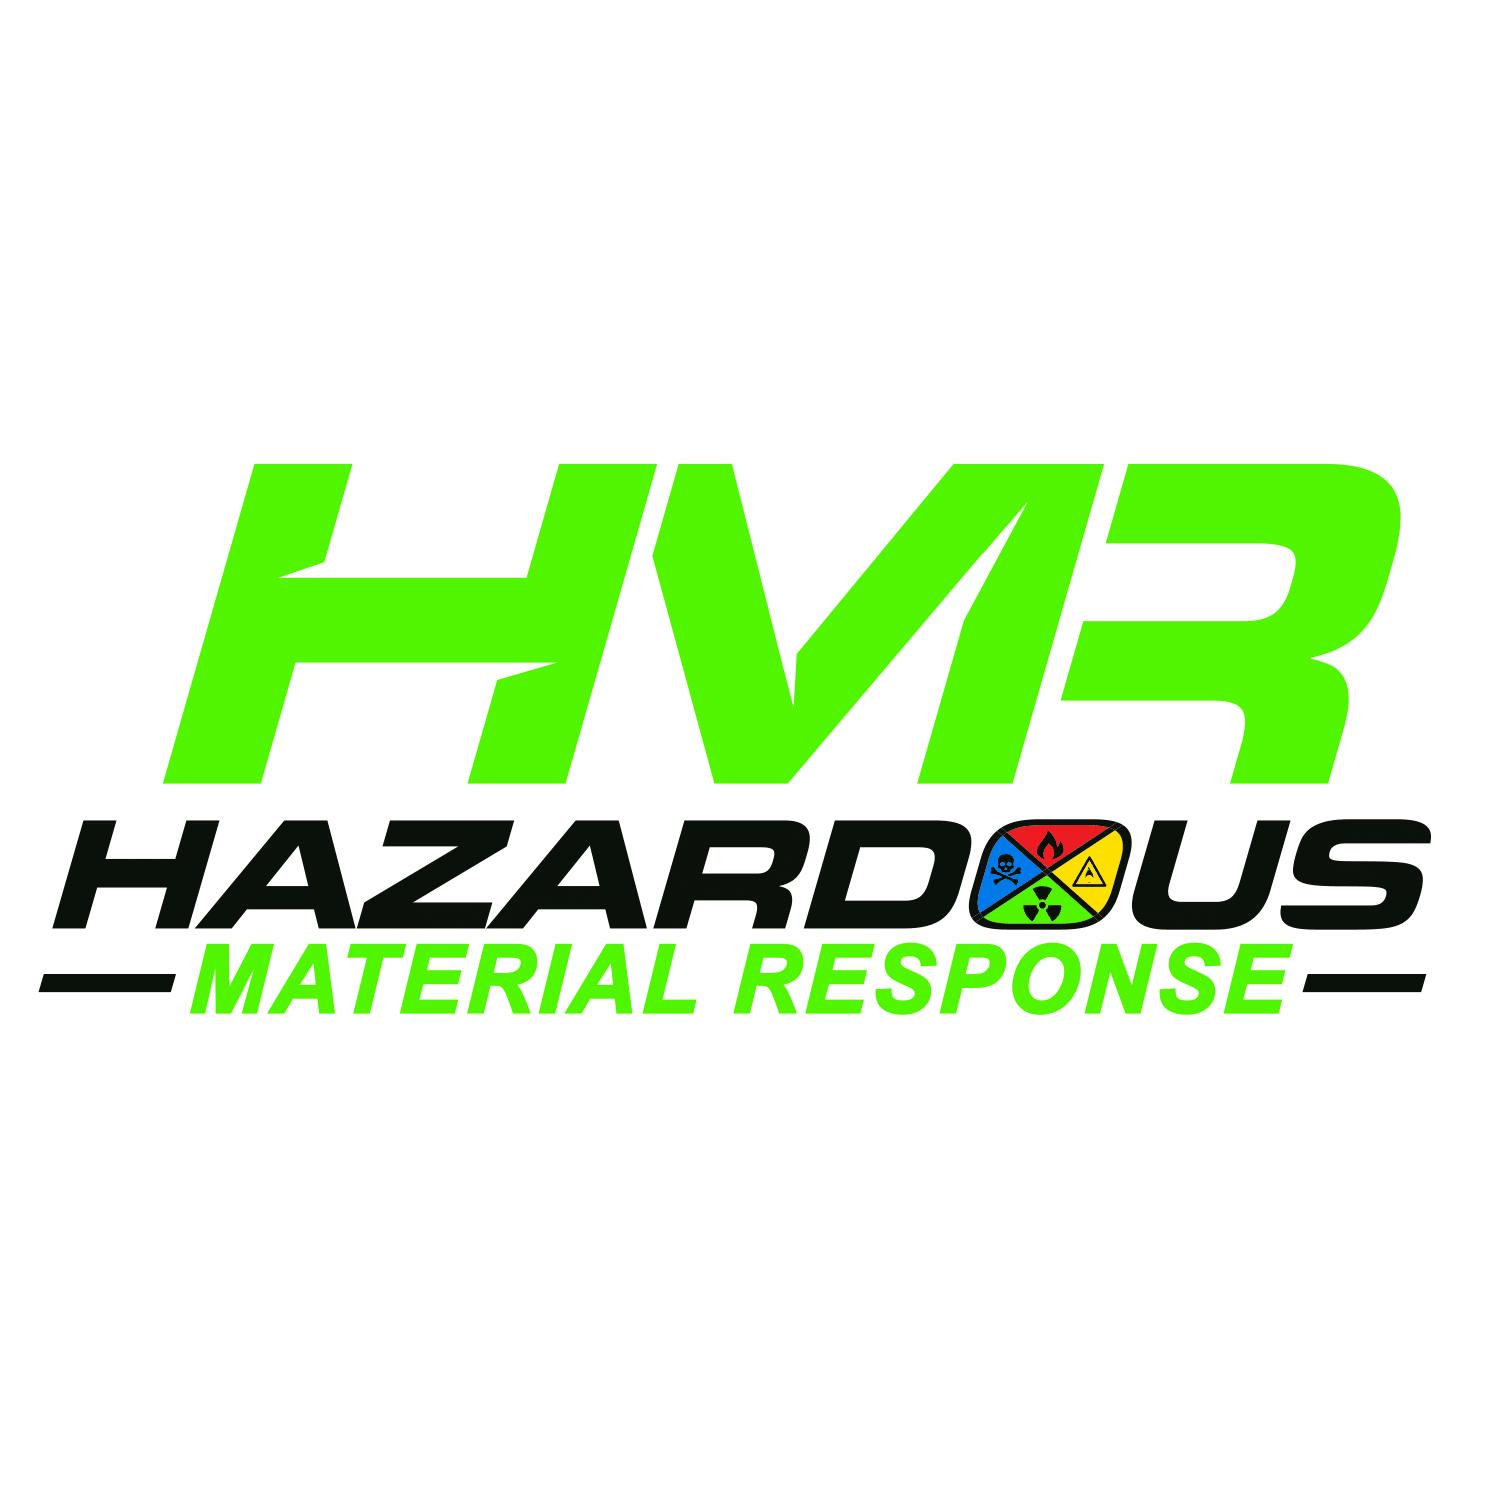 Hazardous Material Response